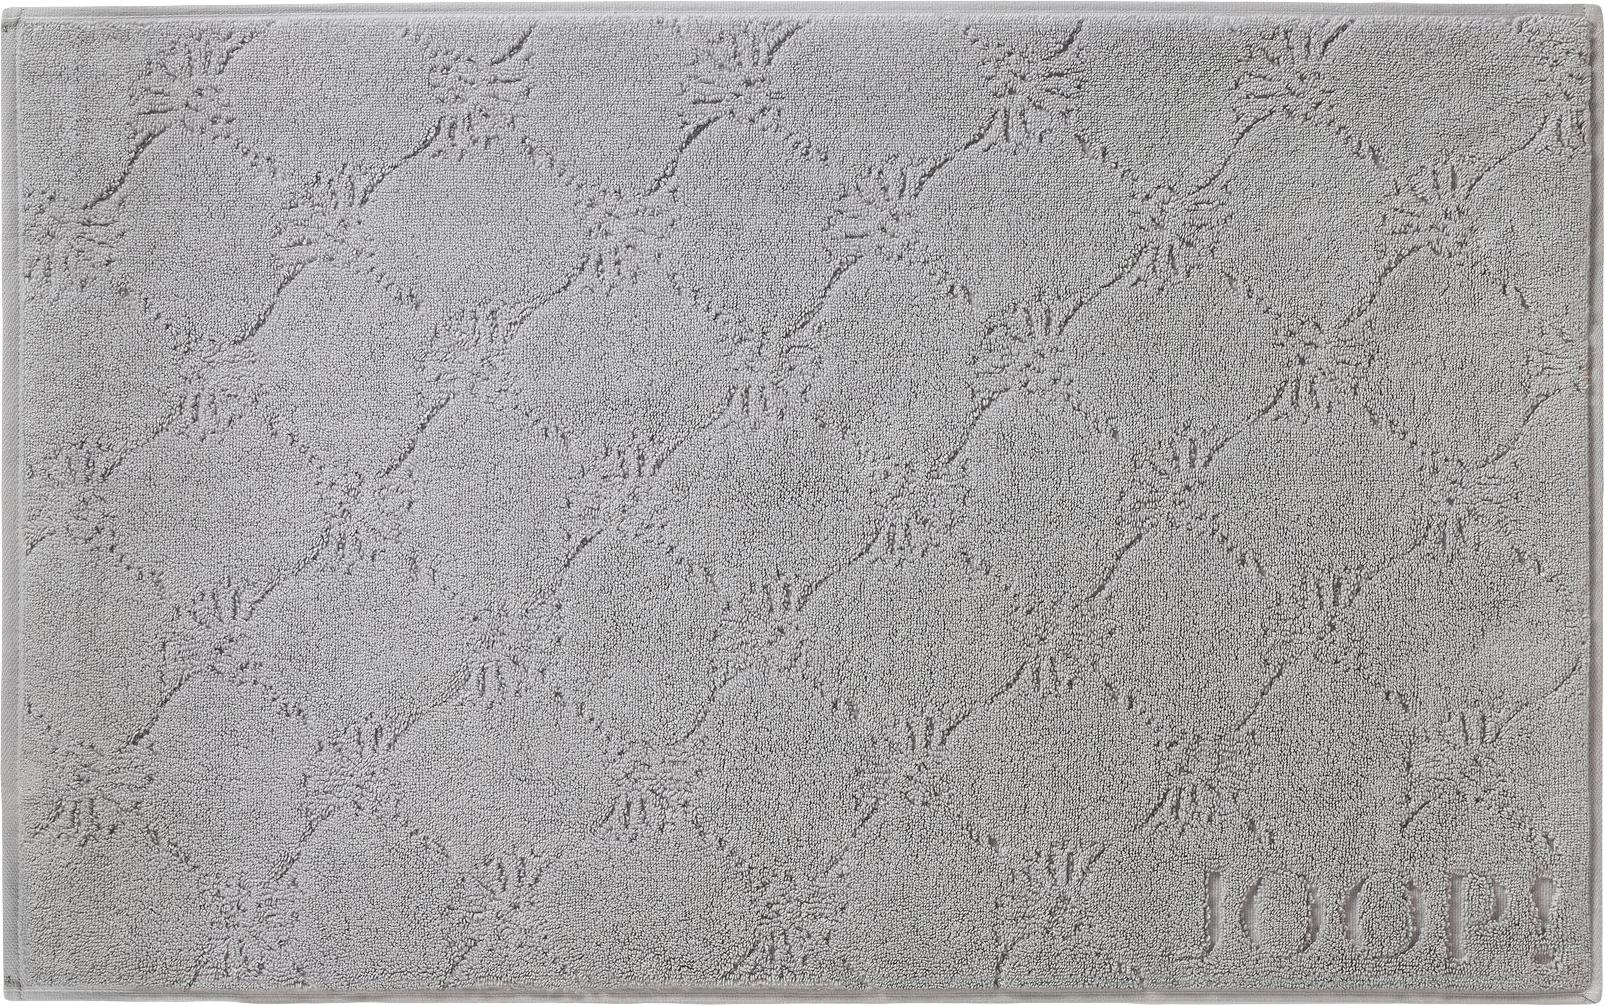 Alfombrilla de baño Cornflower, Gris plata, An 50 x L 80 cm